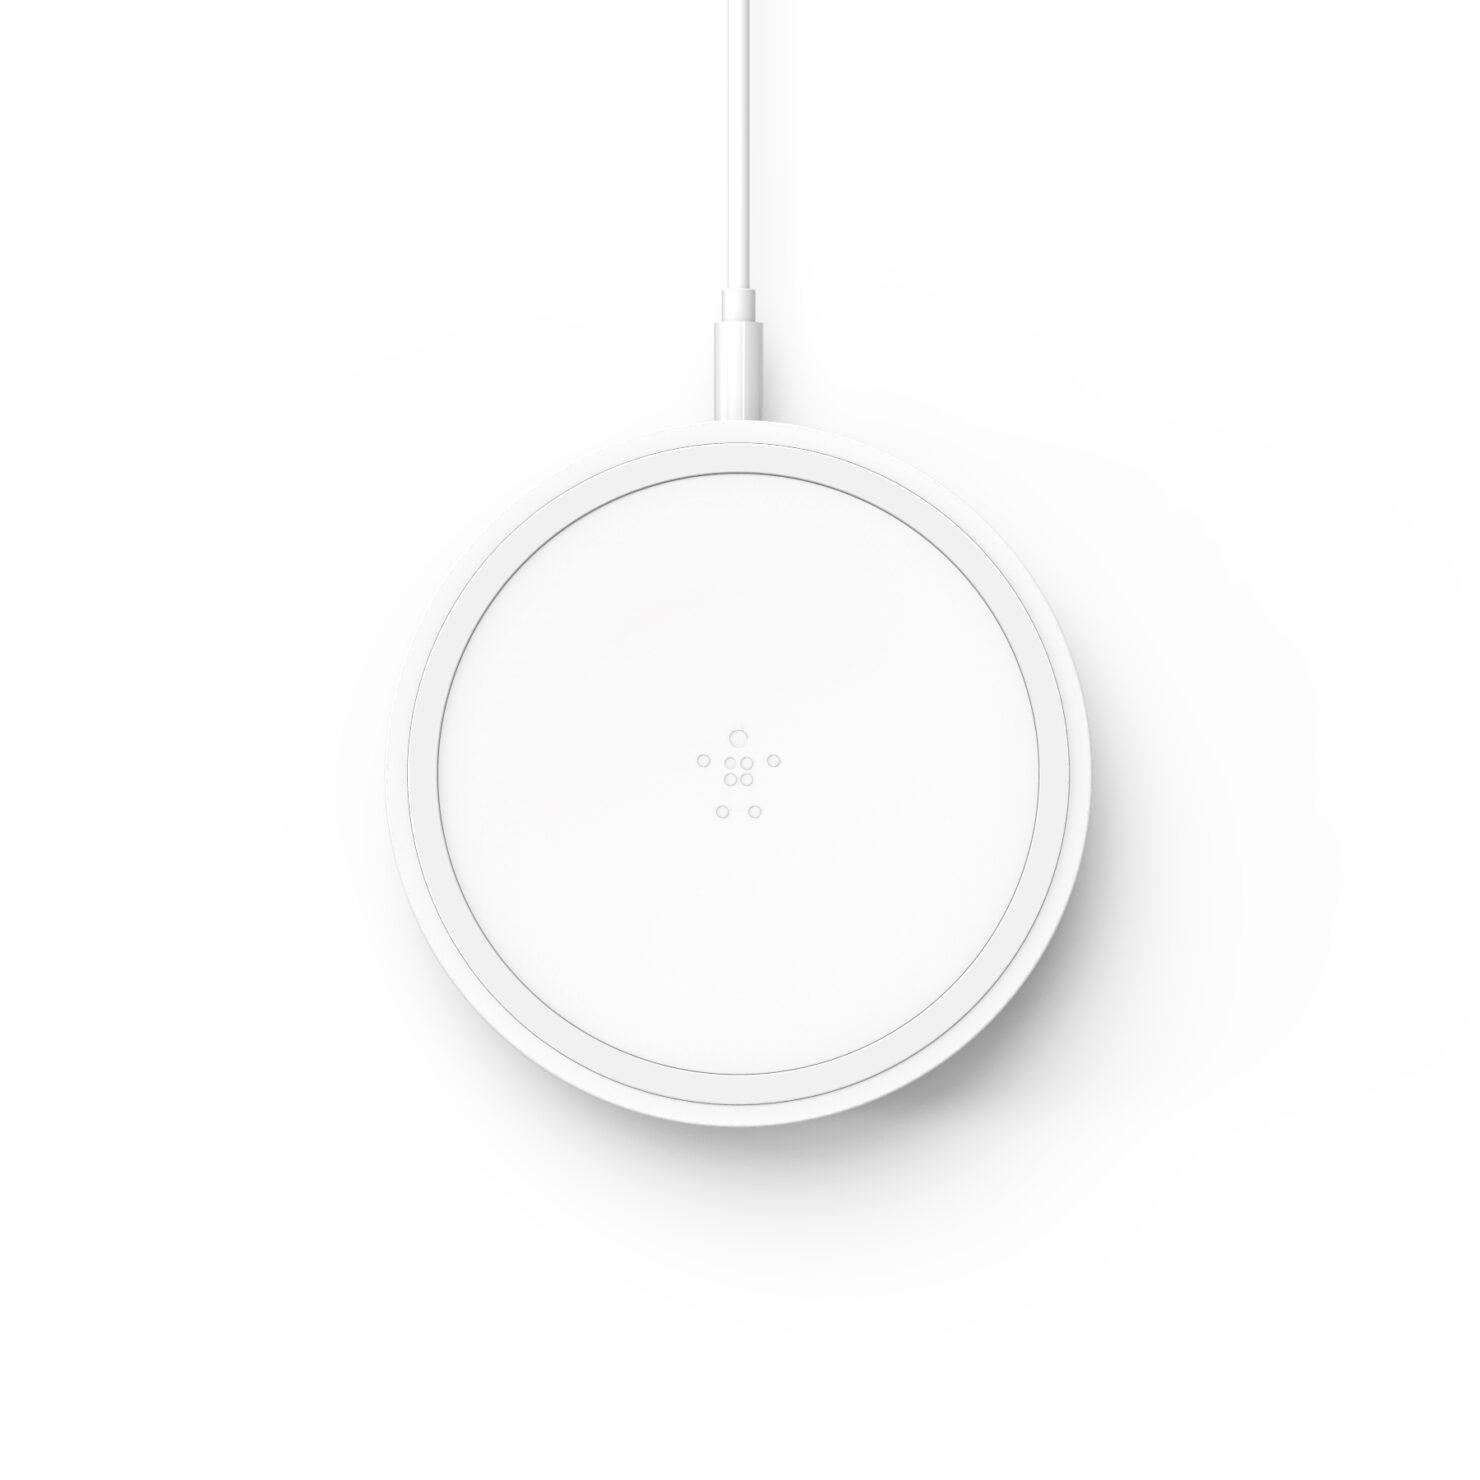 bold_charging_pad_product_2